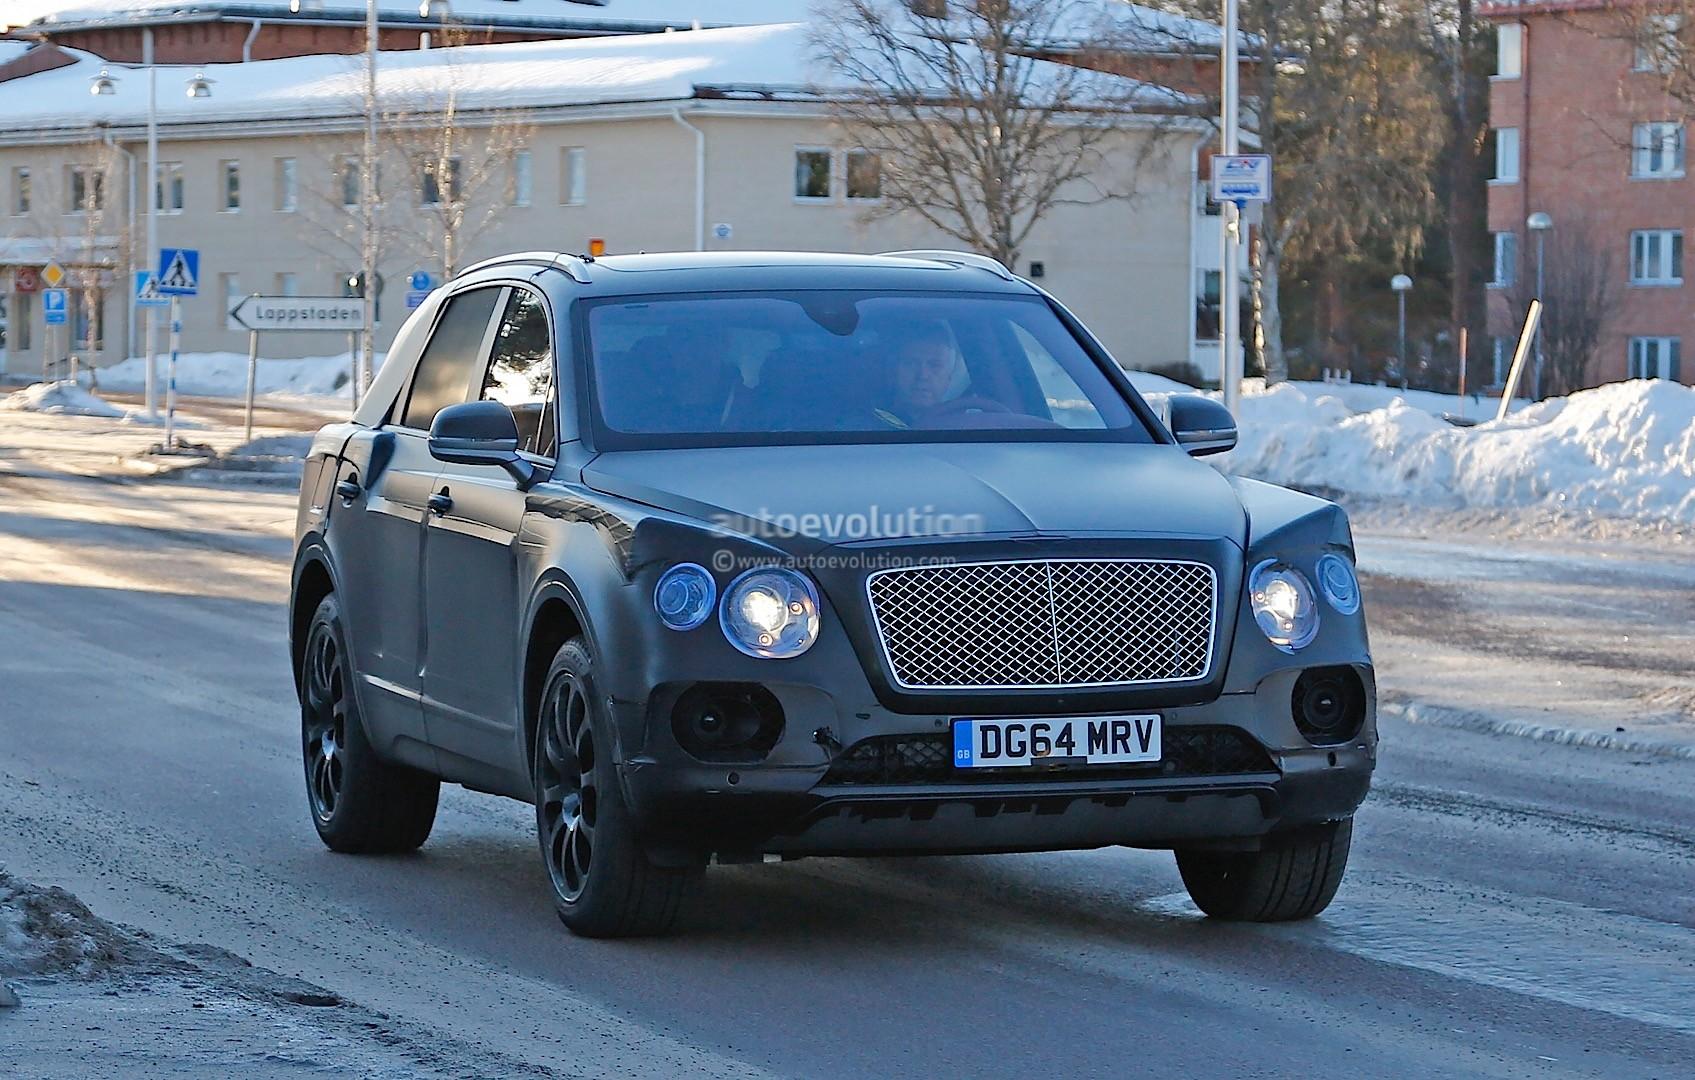 2015 - [Bentley] Bentayga - Page 5 Bentley-bentayga-spied-once-again-looks-like-an-edgier-vw-touareg-photo-gallery_2